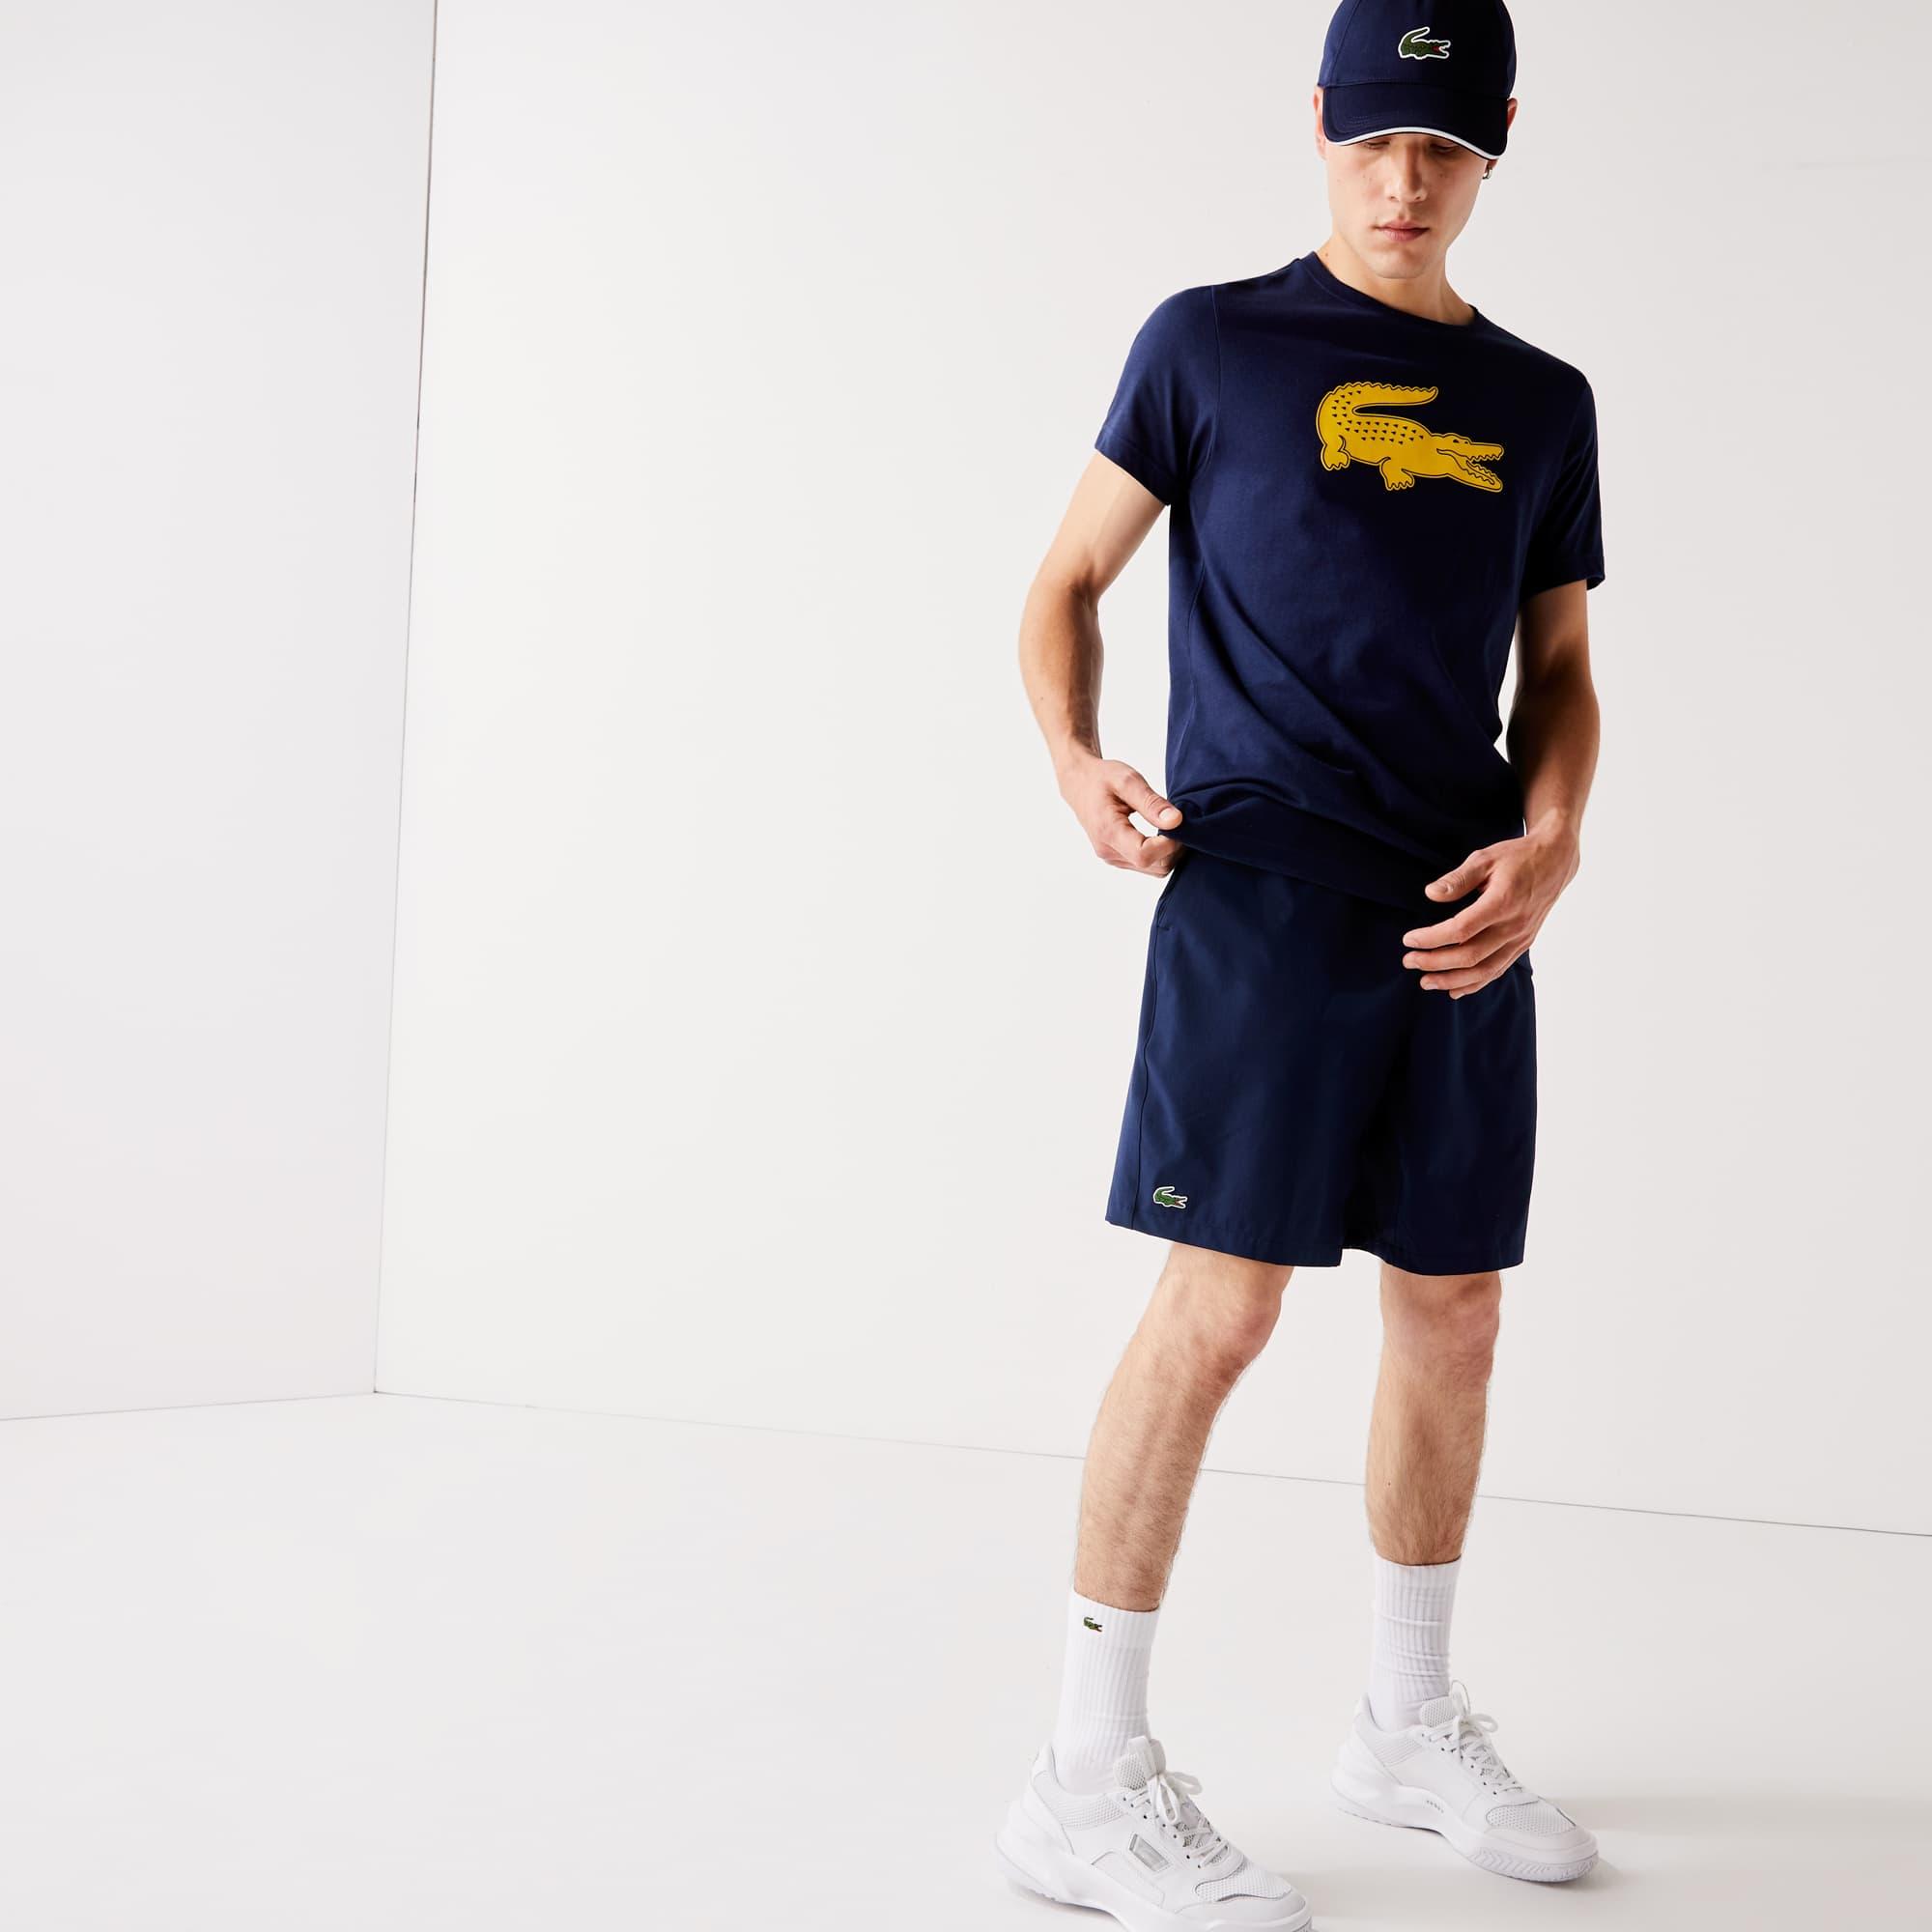 Pantaloncini Tennis Lacoste SPORT stretch tinta unita